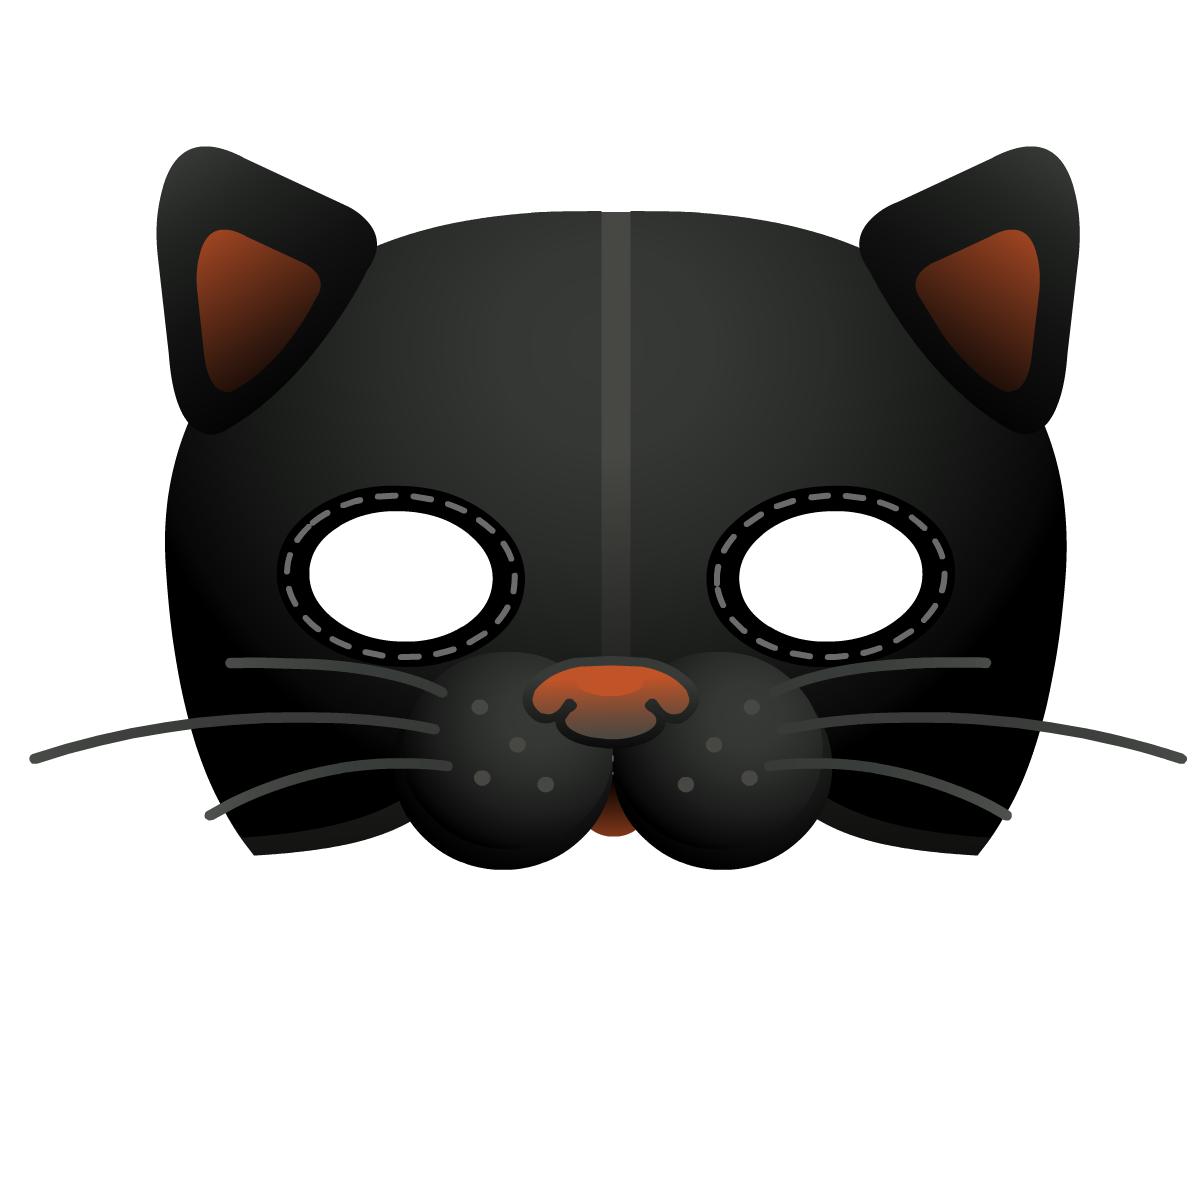 Pumpkin decoration Halloween crafts: cat mask